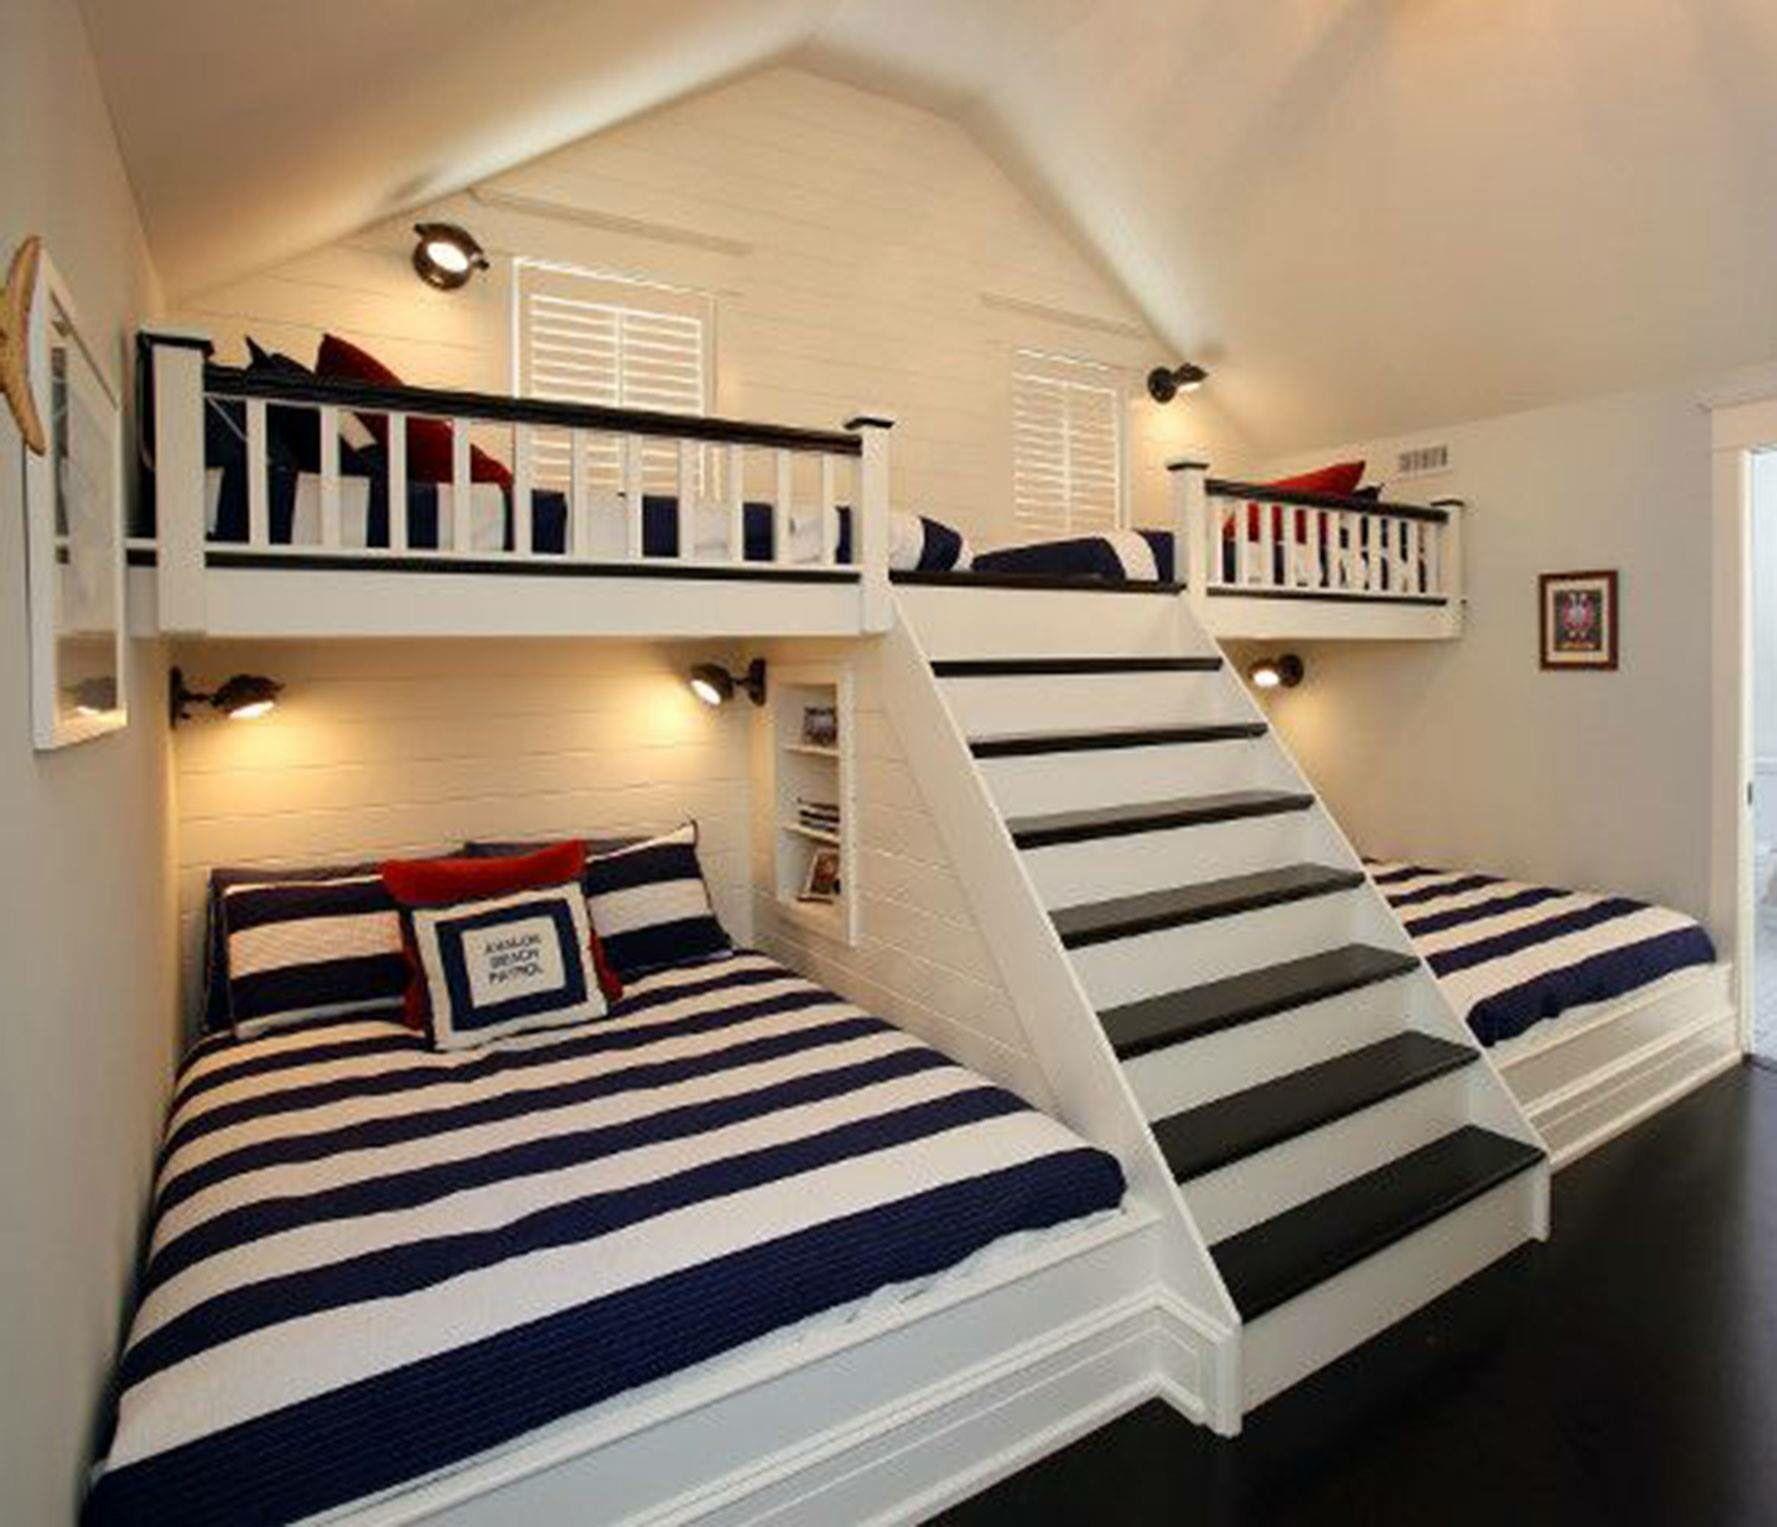 Loft bedroom ideas kids  DIY Bedroom Ideas For Girls Or Boys  Furniture  Lake remodel